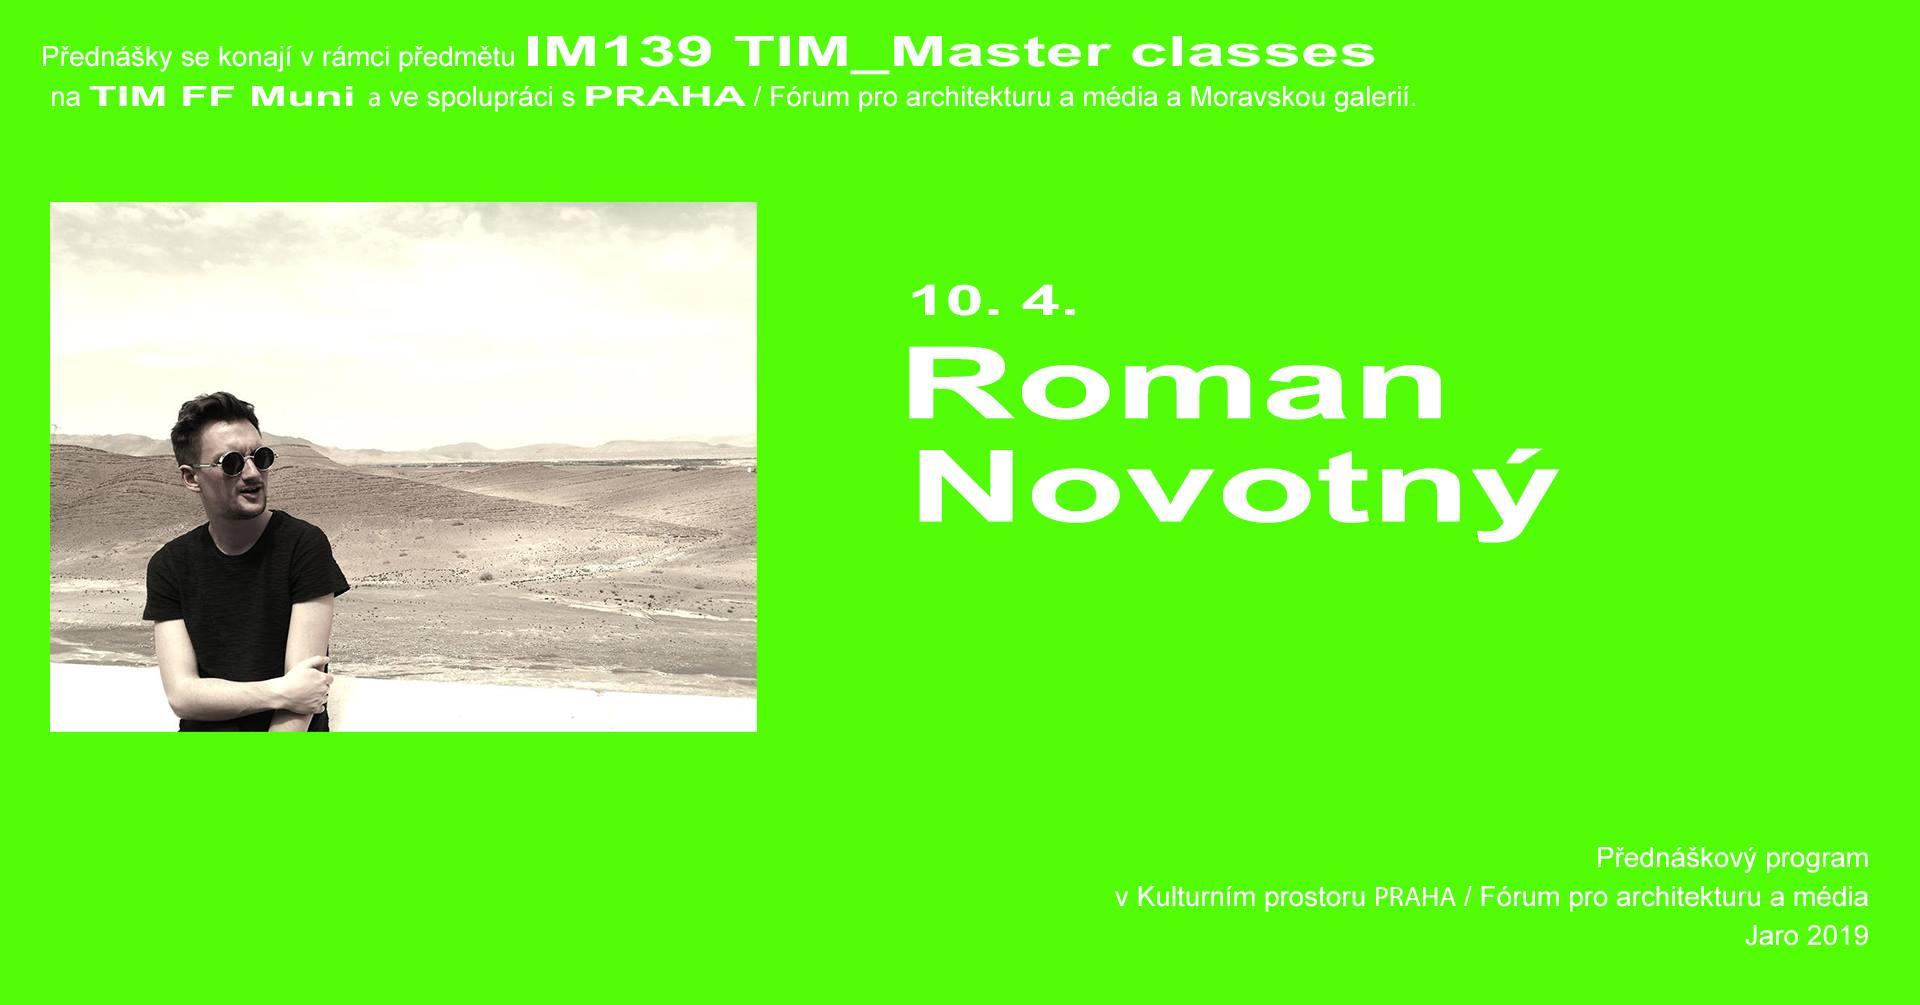 ST / 10.4. / 19.00 / TIM Master class: Roman Novotný – Hegemonie designu / přednáška, diskuse